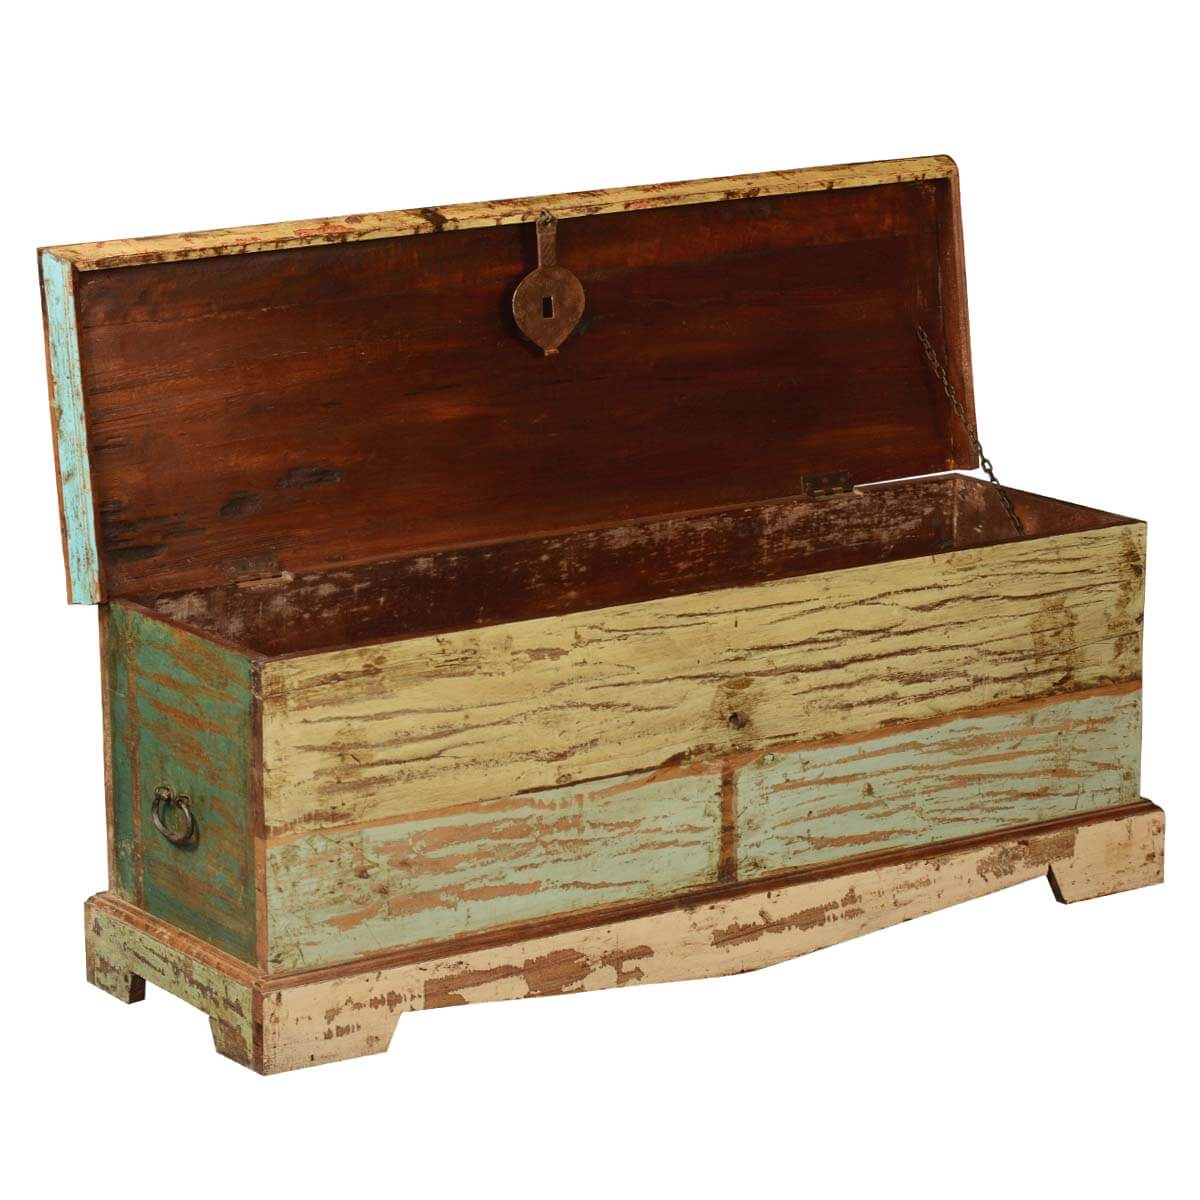 Reclaimed Wood Stump Coffee Table: Attic Treasure Reclaimed Wood Coffee Table Chest Storage Trunk